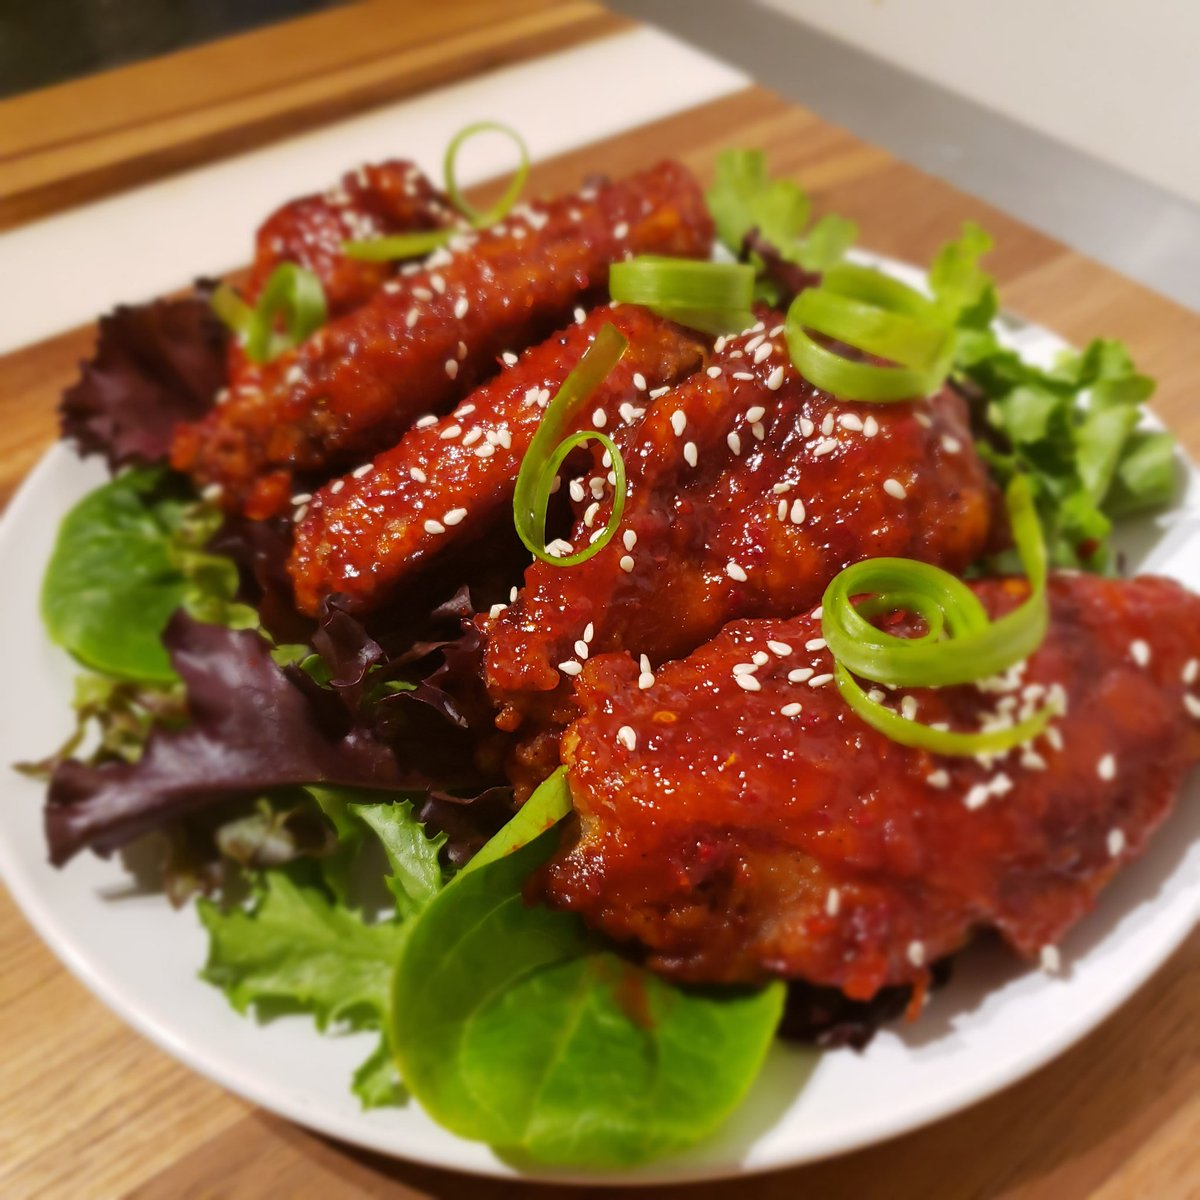 Korean style wings #foodie #food #sweet #foodgasm #hungry #lunch #tasty #delicious #dinner #foodpic #eat #foodporn #islandhutqzine #FreshTweets #foodpics #yum #photooftheday #njfood #trini #caribbean #nj #njfoodie #nycpic.twitter.com/wiITWFvoZj